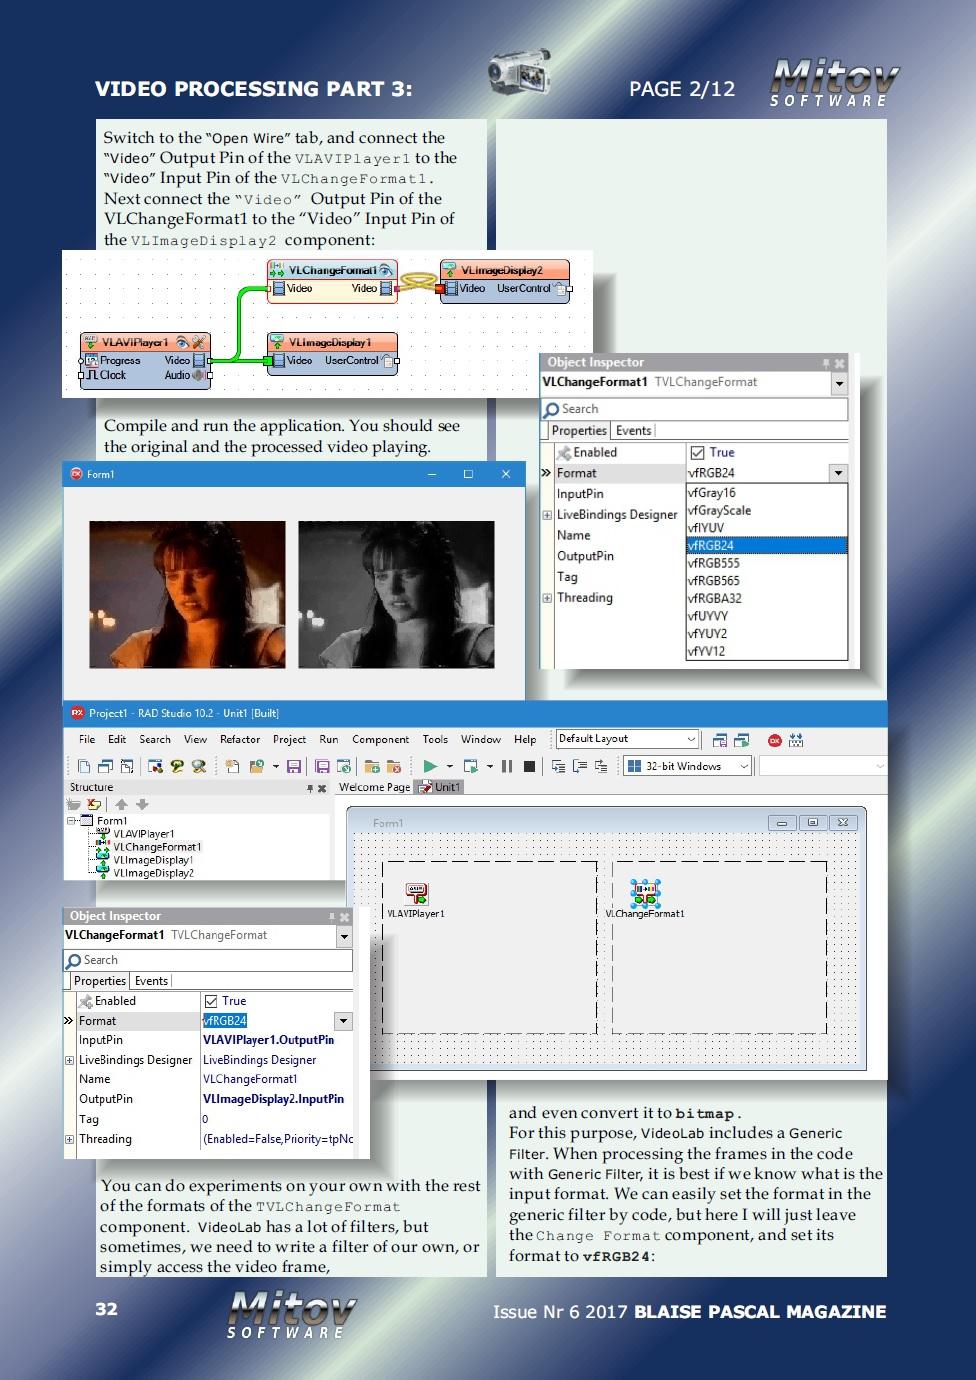 Mitov Software: My